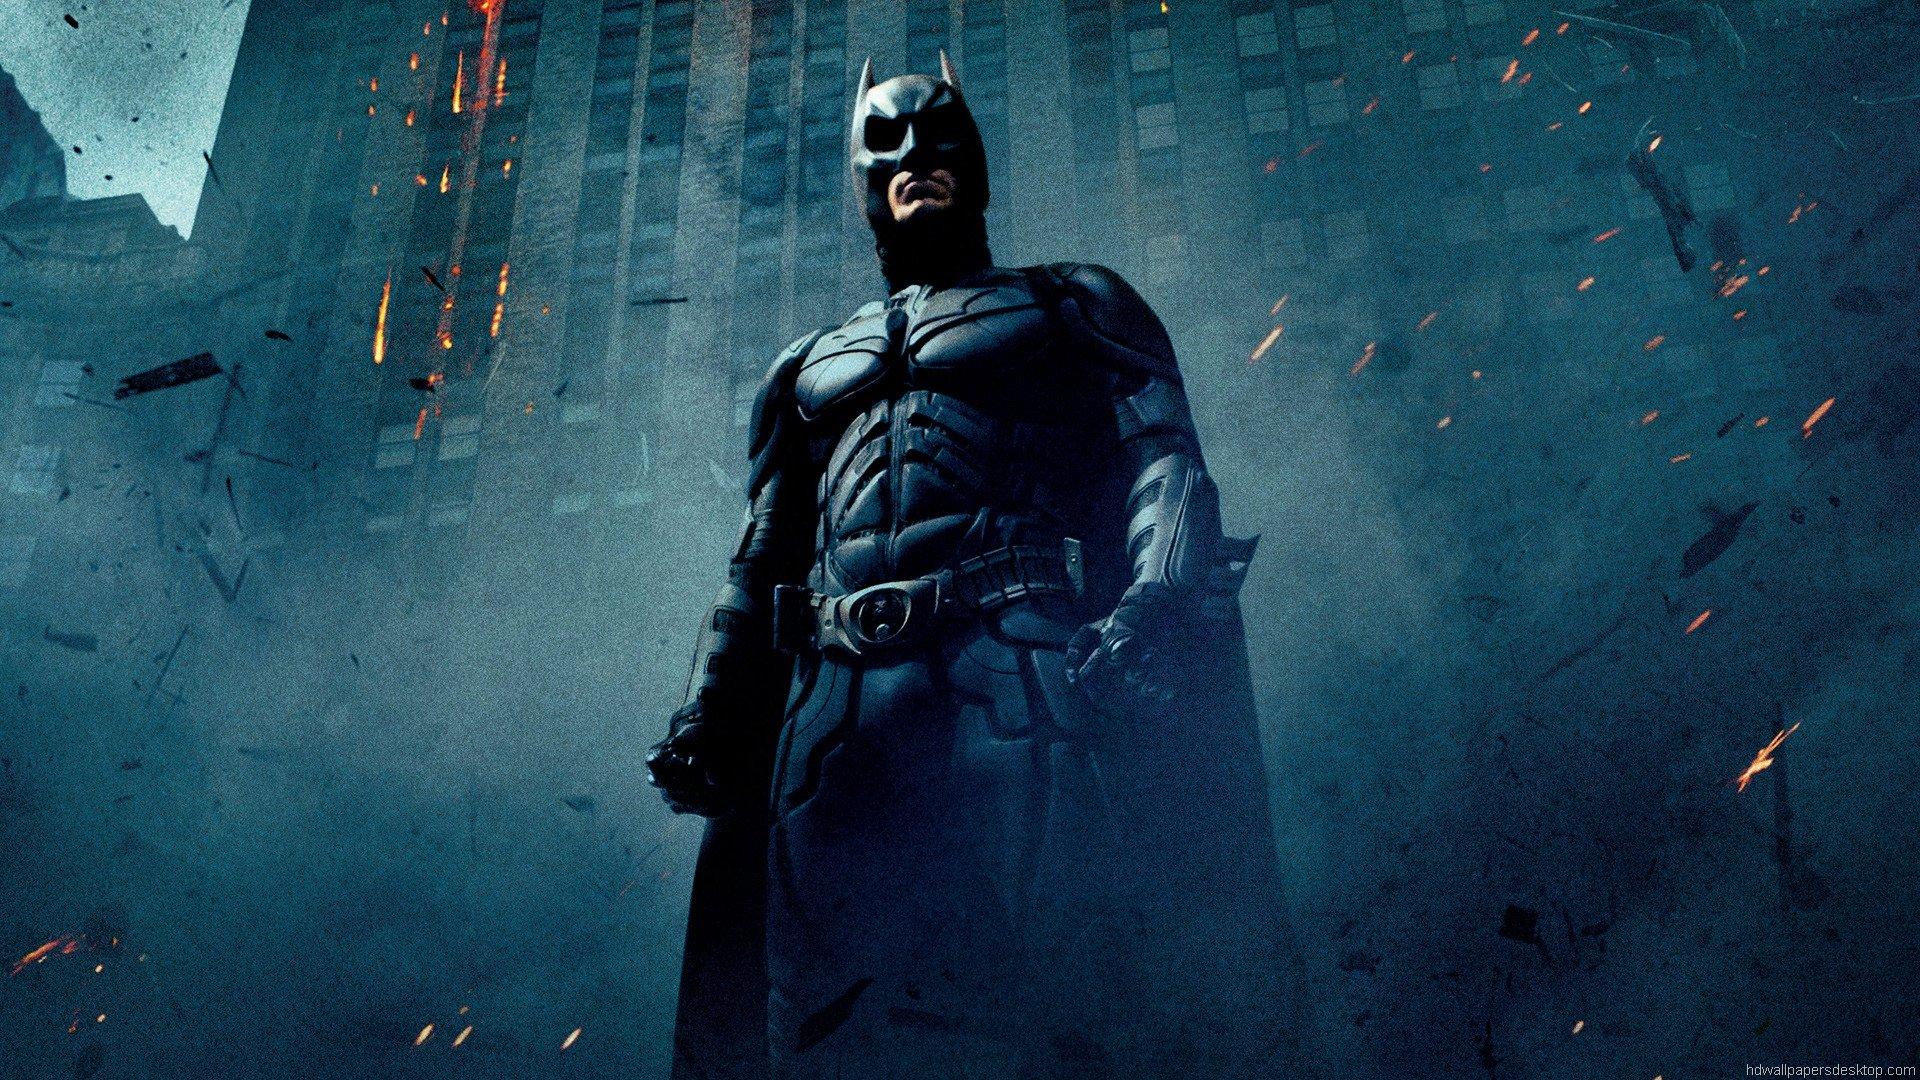 The Dark Knight Wallpaper Batman Hd Widescreen 1920x1080 Pictures 1920x1080